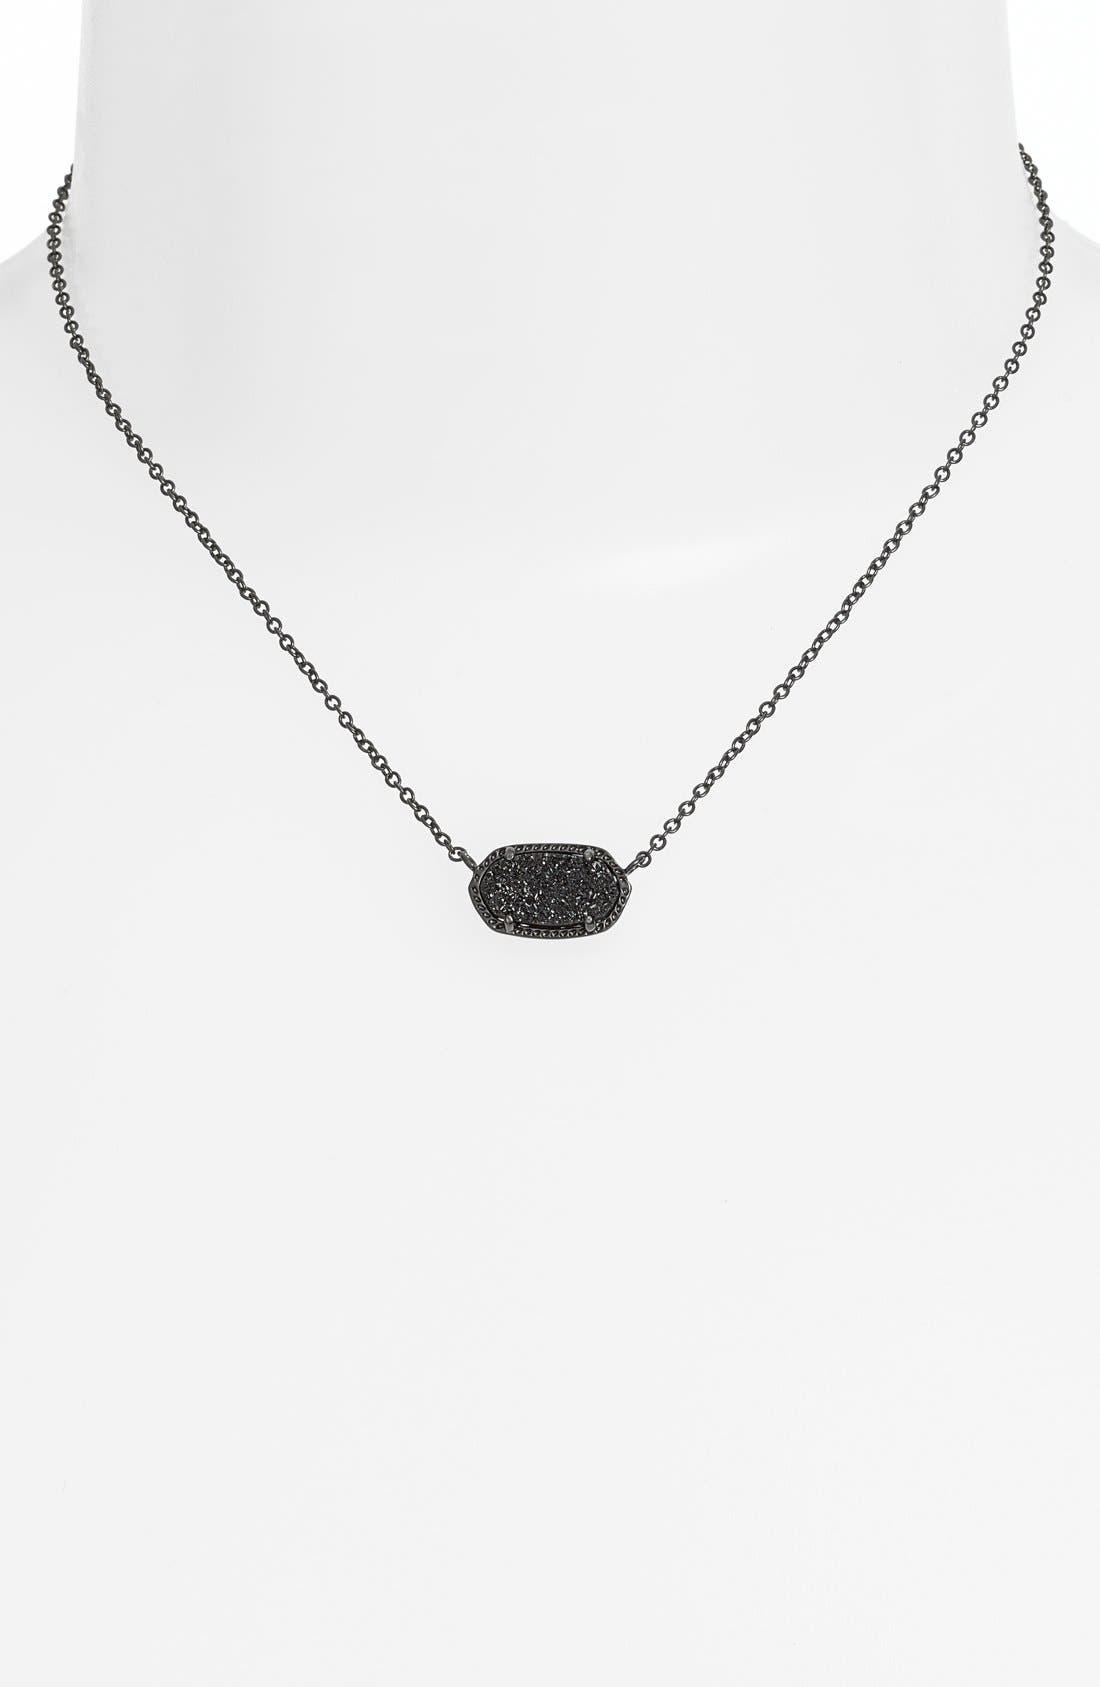 Elisa Filigree Pendant Necklace,                             Main thumbnail 1, color,                             GUNMETAL/ BLACK DRUSY